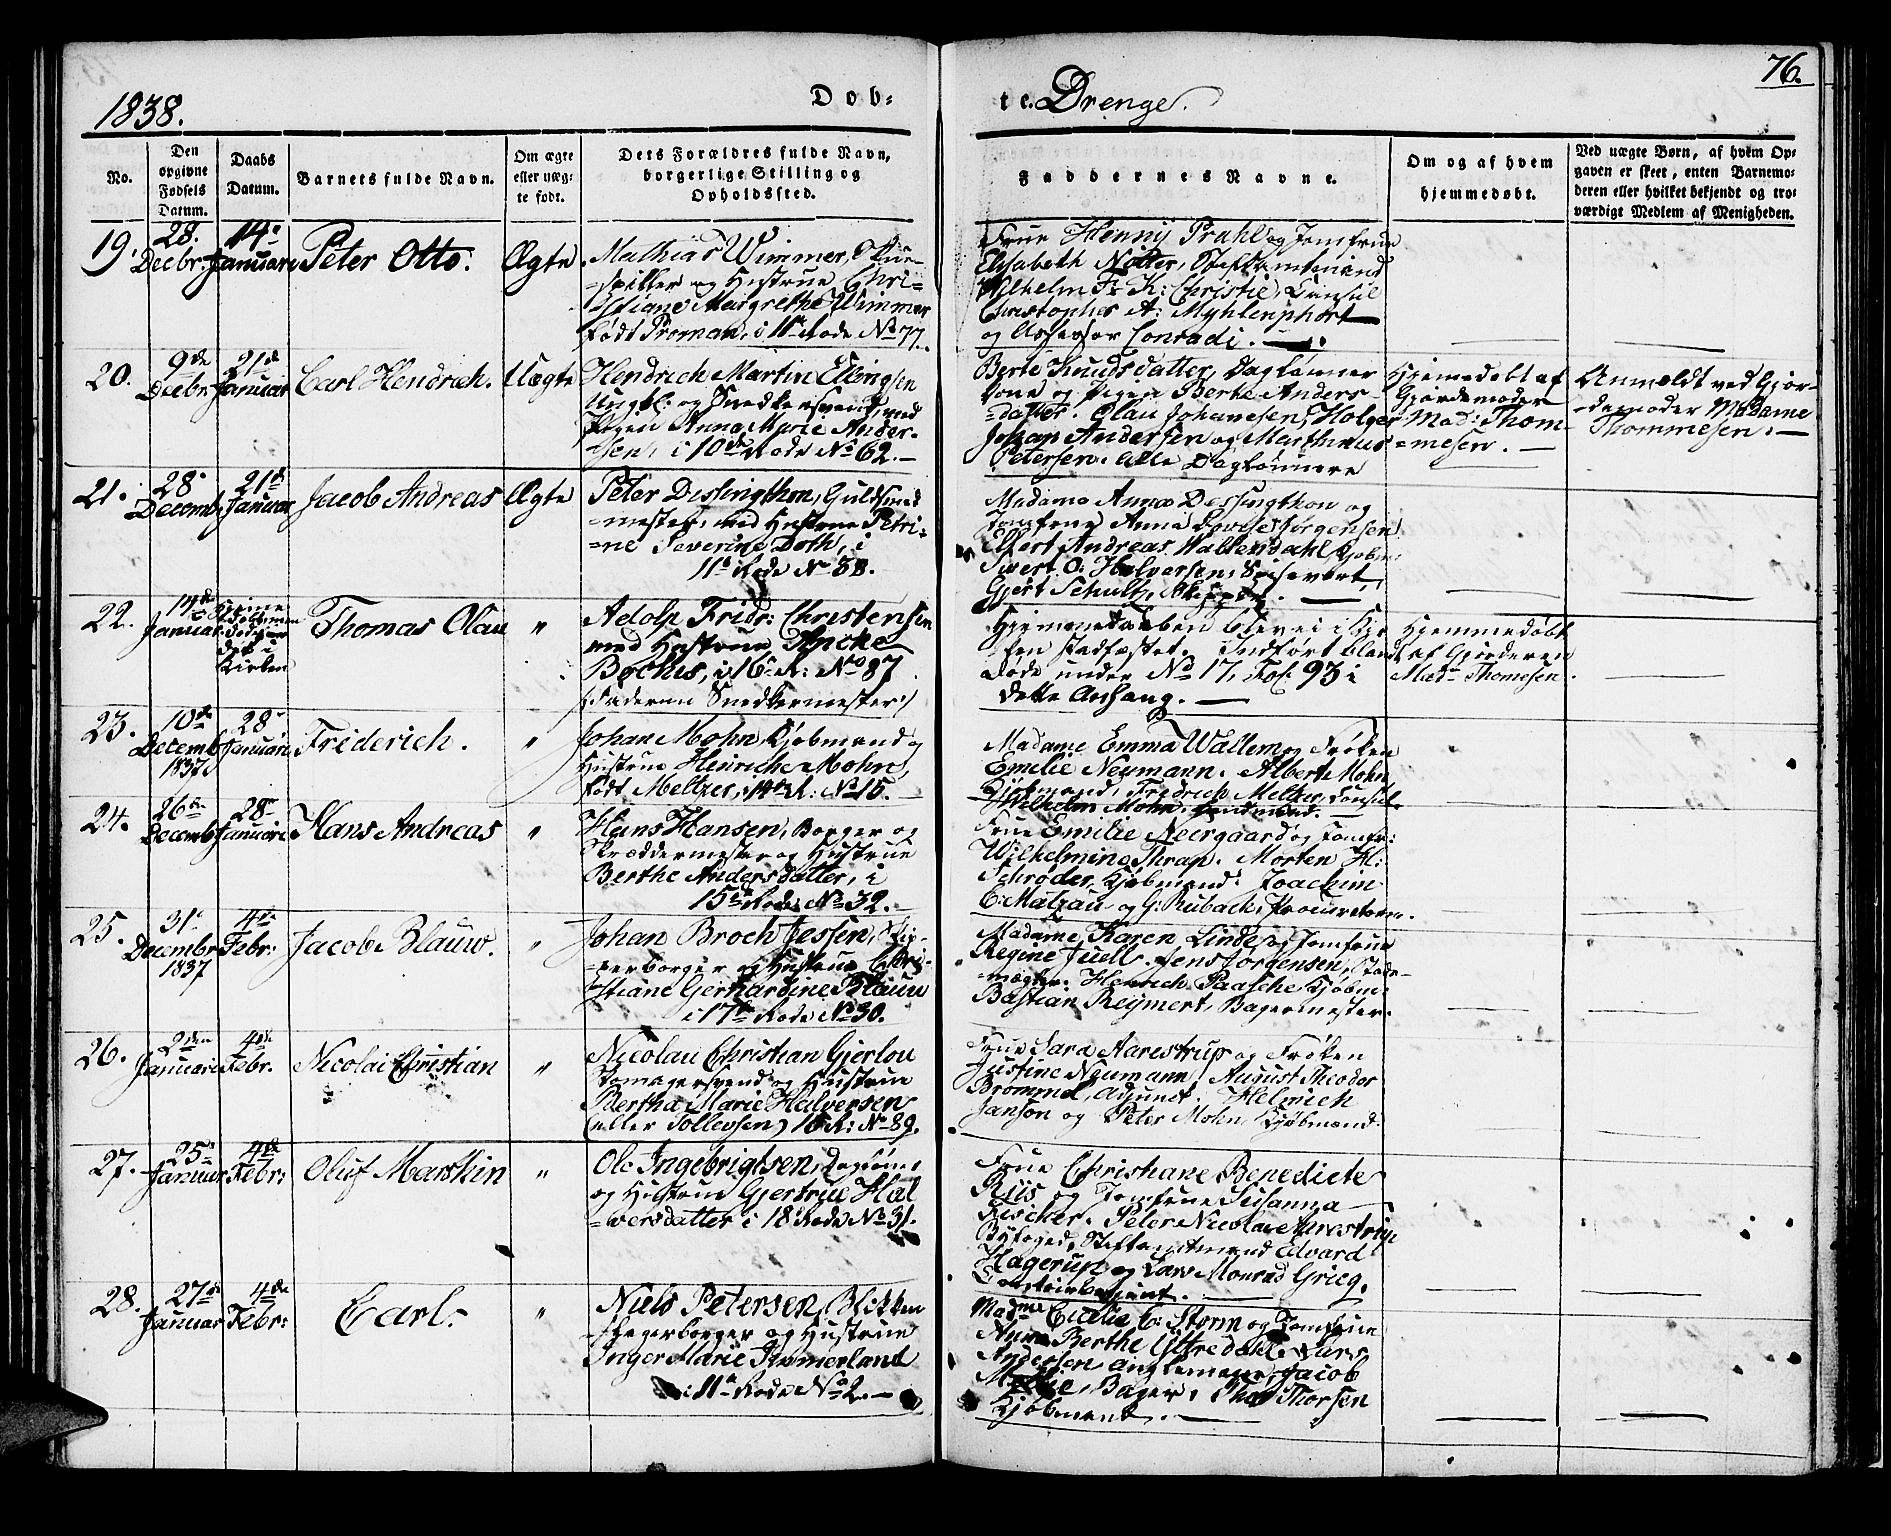 SAB, Domkirken sokneprestembete, H/Haa/L0015: Ministerialbok nr. A 14, 1835-1840, s. 76